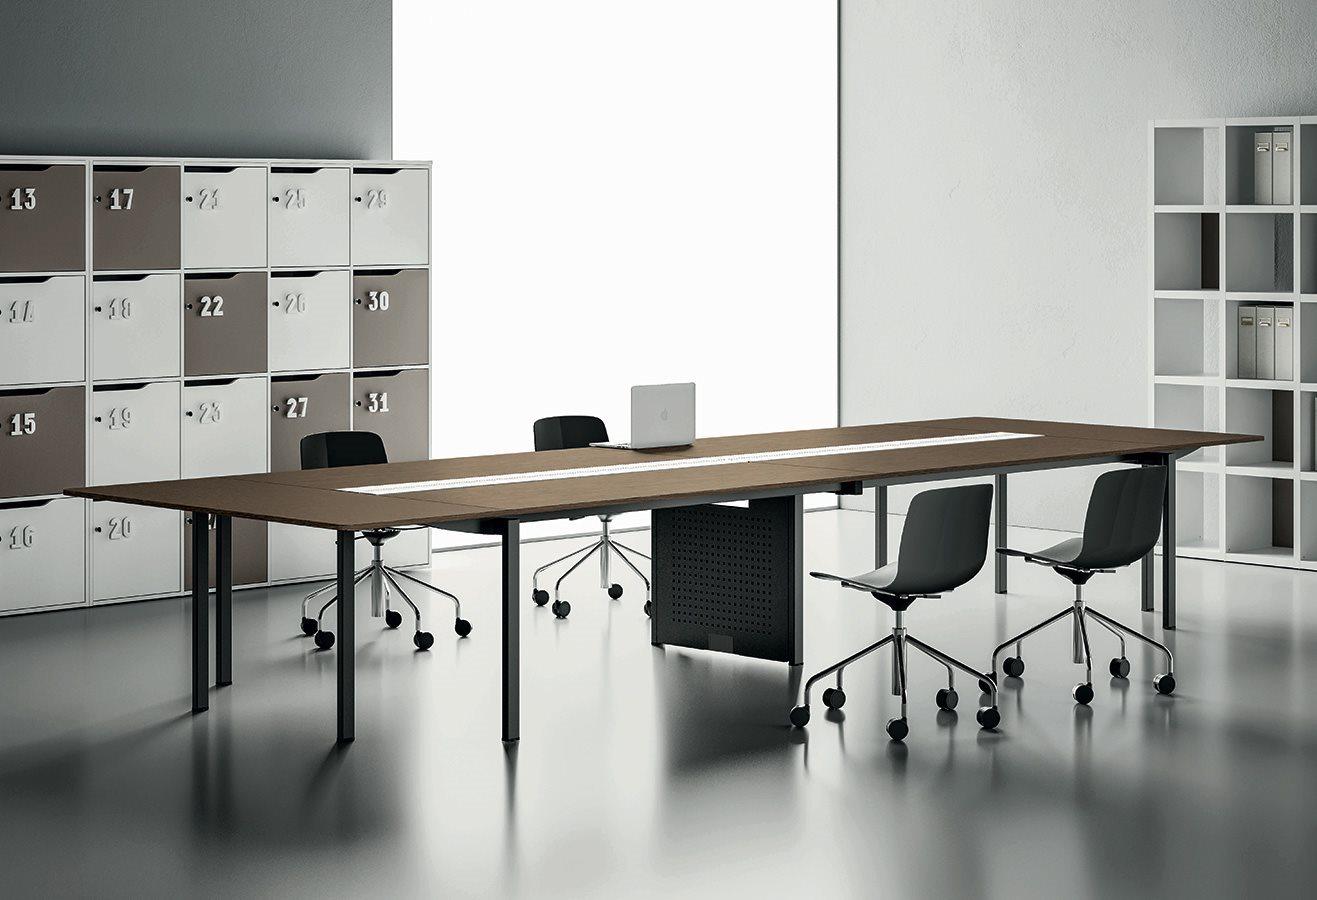 dvo_tavoli_DV990_workstation-table_gallery_2_zoom